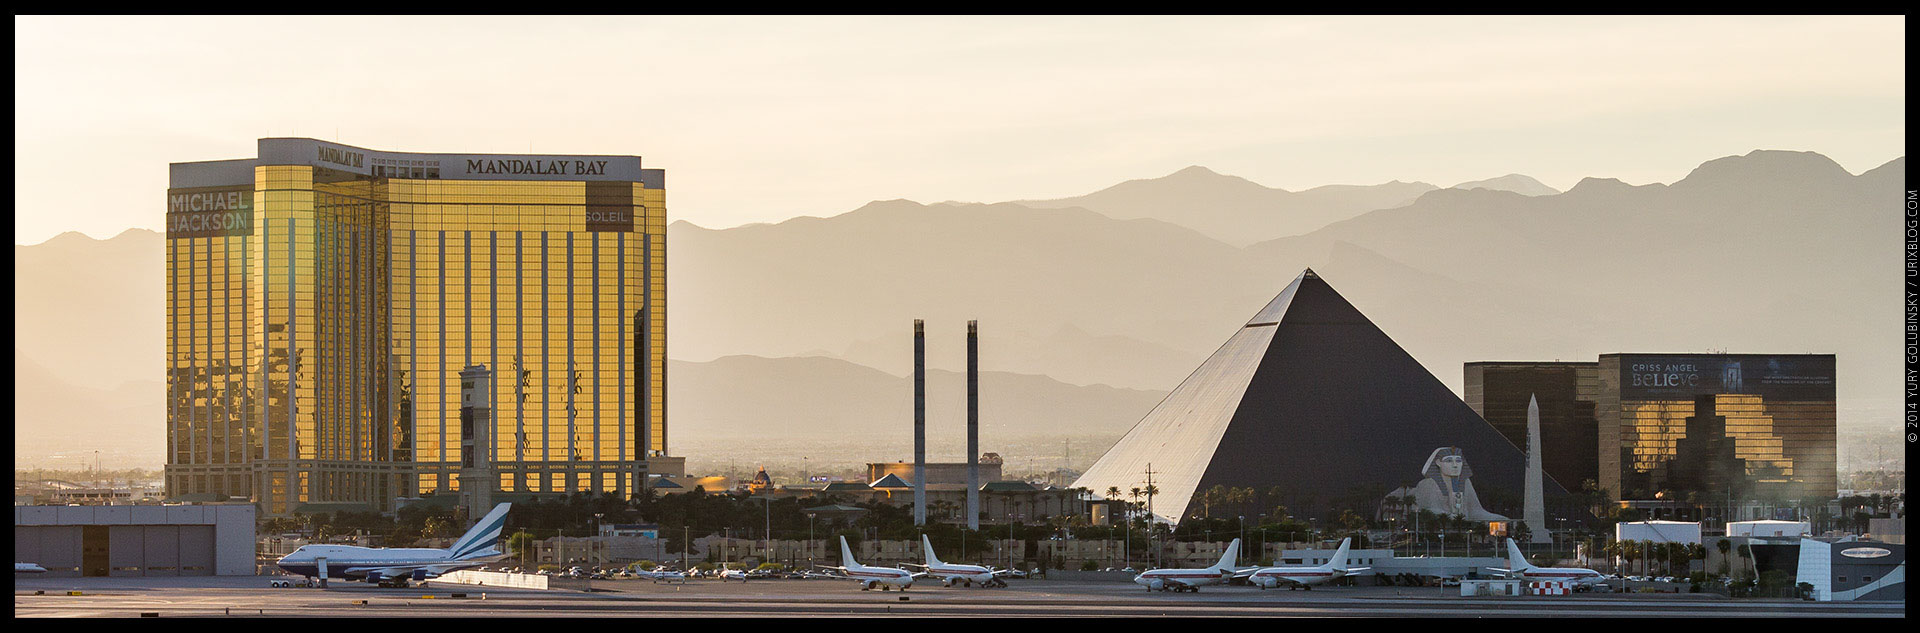 Mandalay Bay, Luxor, casino, hotel, 2014, airplanes, LAS, Las Vegas McCarran International airport, strip, LV, Clark County, USA, Nevada, panorama, horizon, city